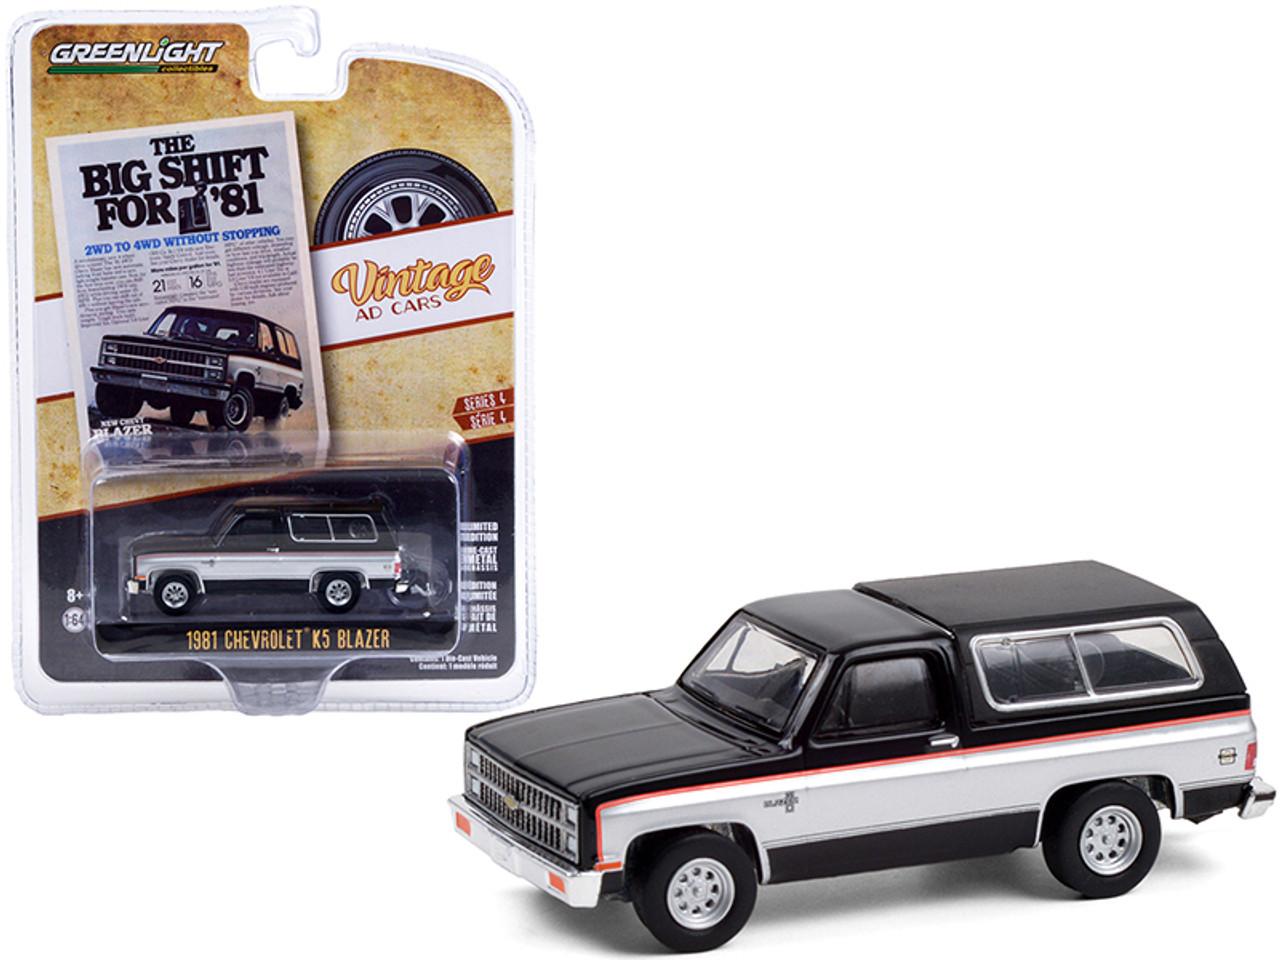 1981 Dodge Mini Ram Wagon Ad 80-SM-07